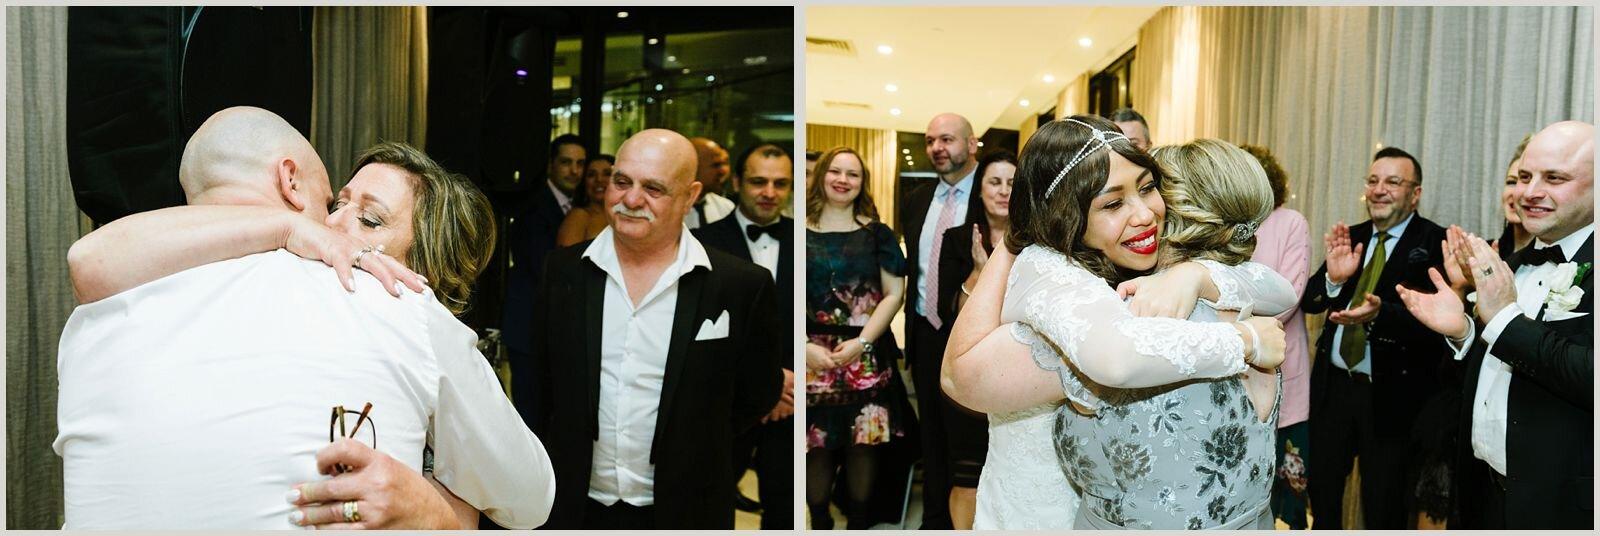 joseph_koprek_wedding_melbourne_the_prince_deck_0100.jpg